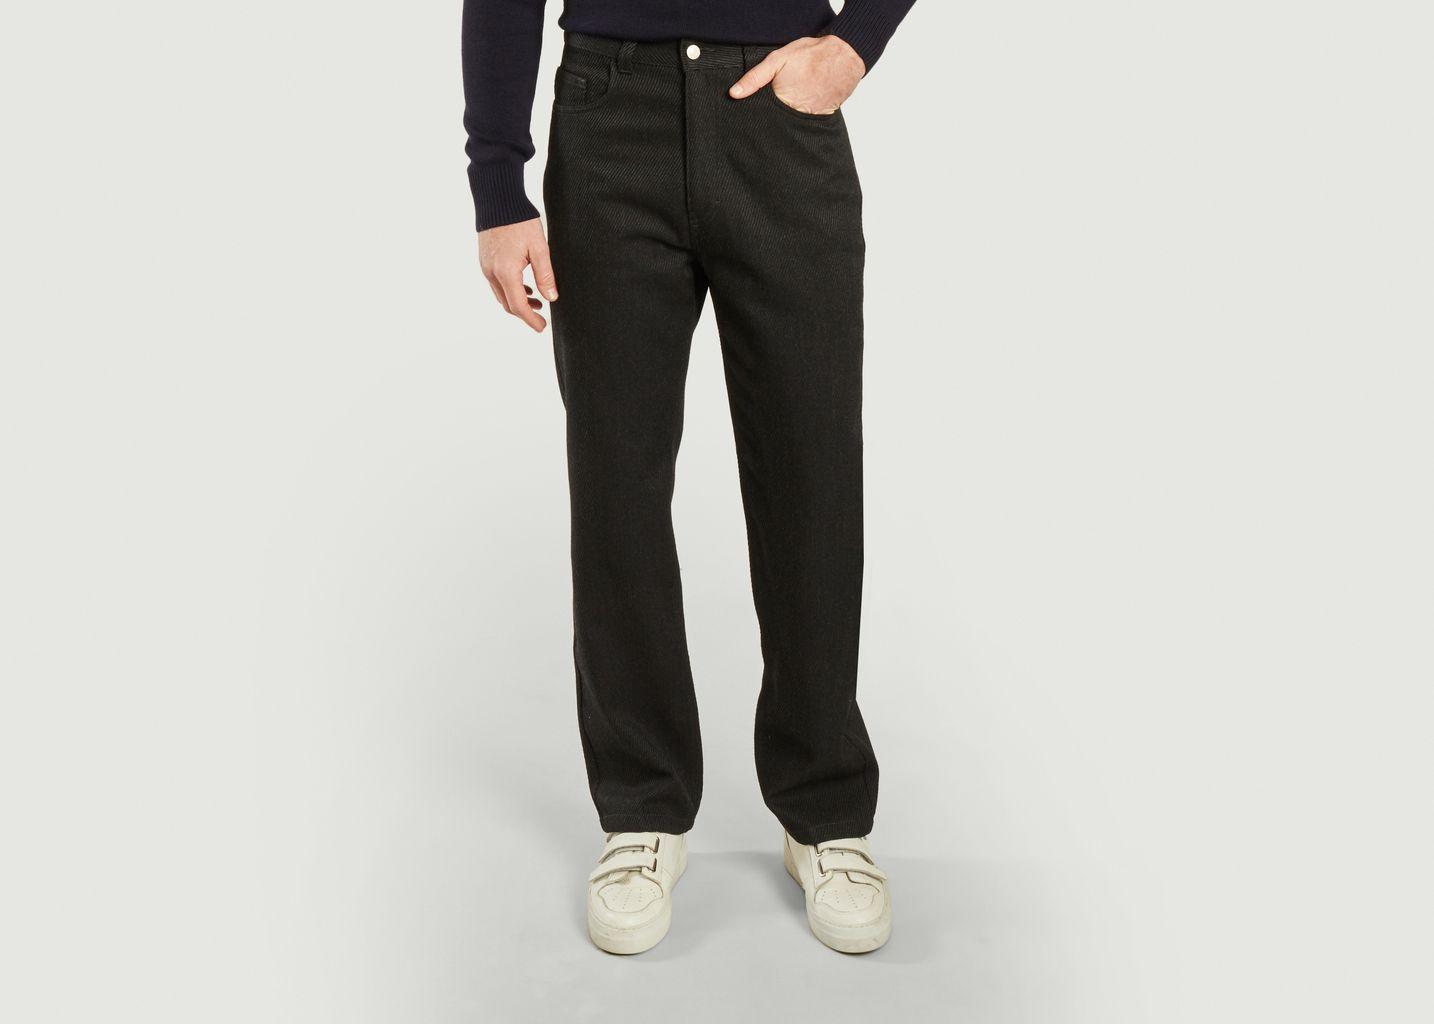 Pantalon Carotte - AMI Paris